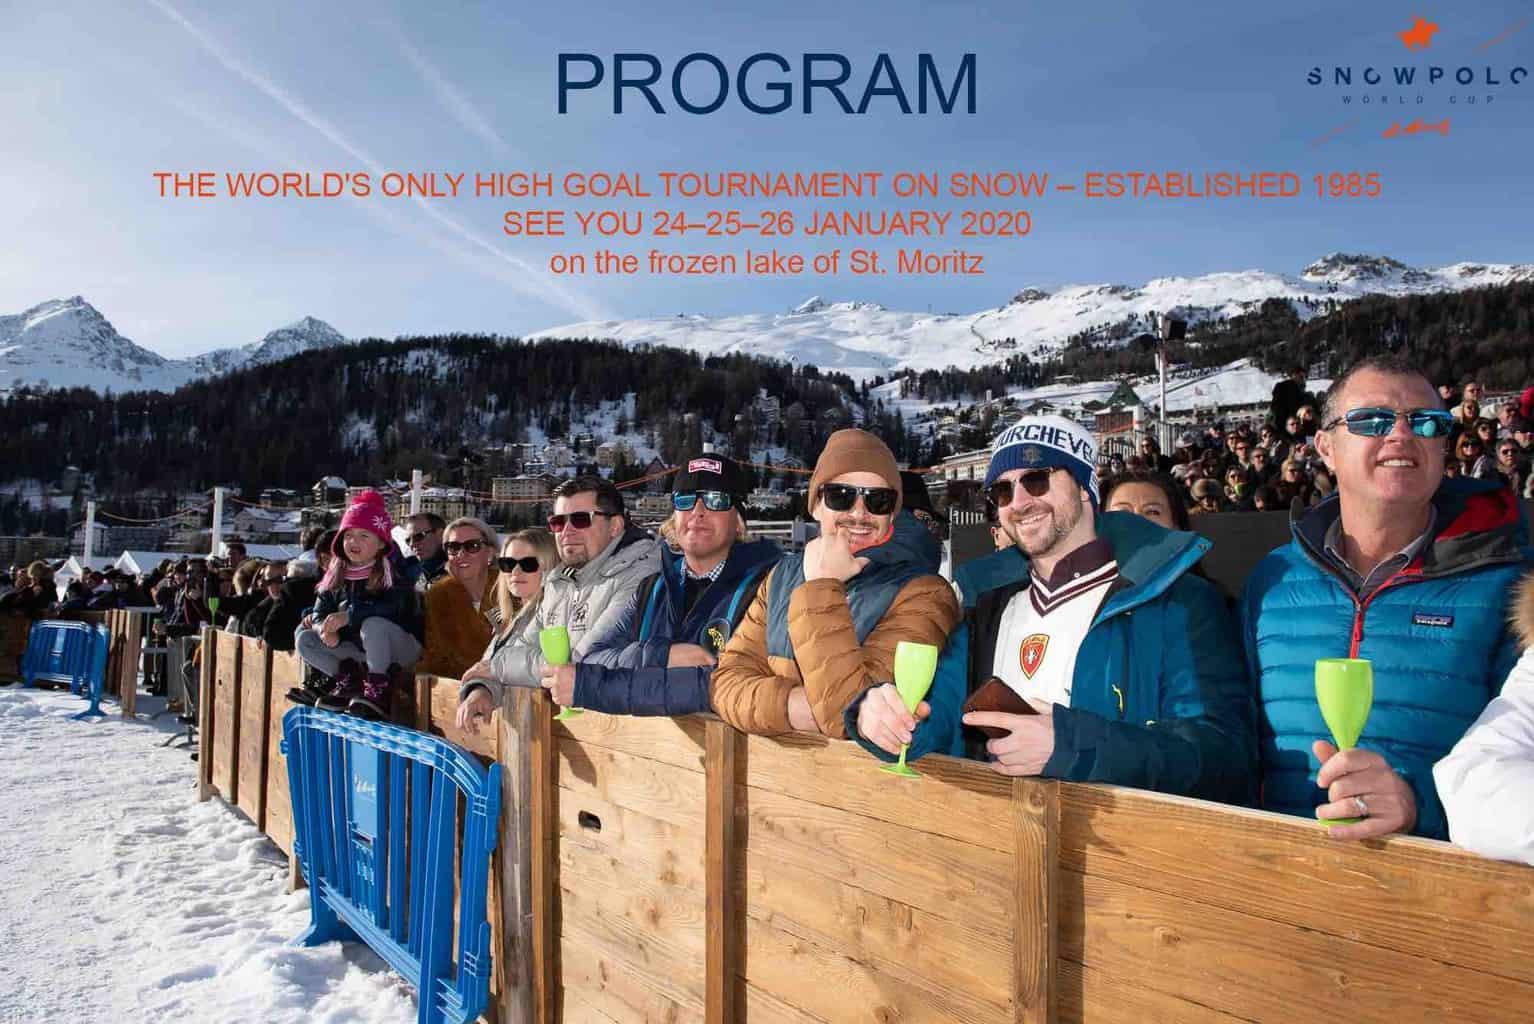 Dt Moritz Sow Polo Program